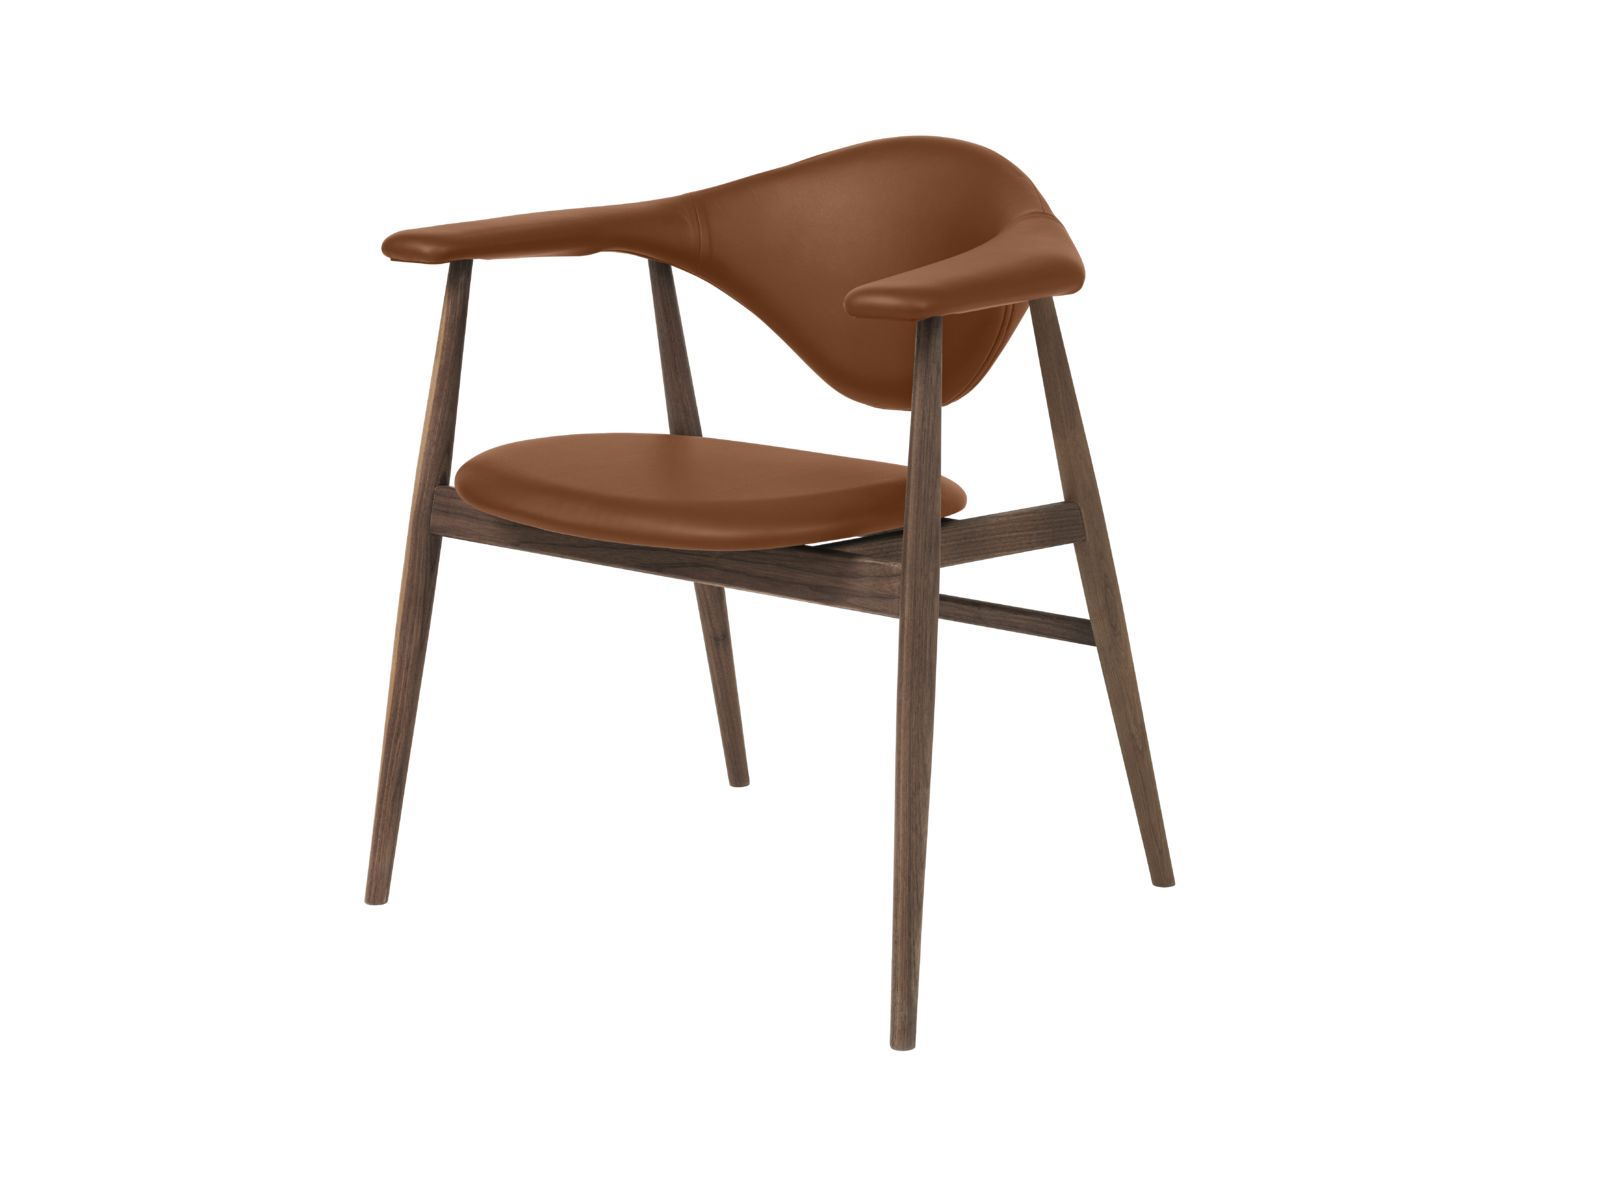 Gubi Masculo Chair Design Gamfratesi